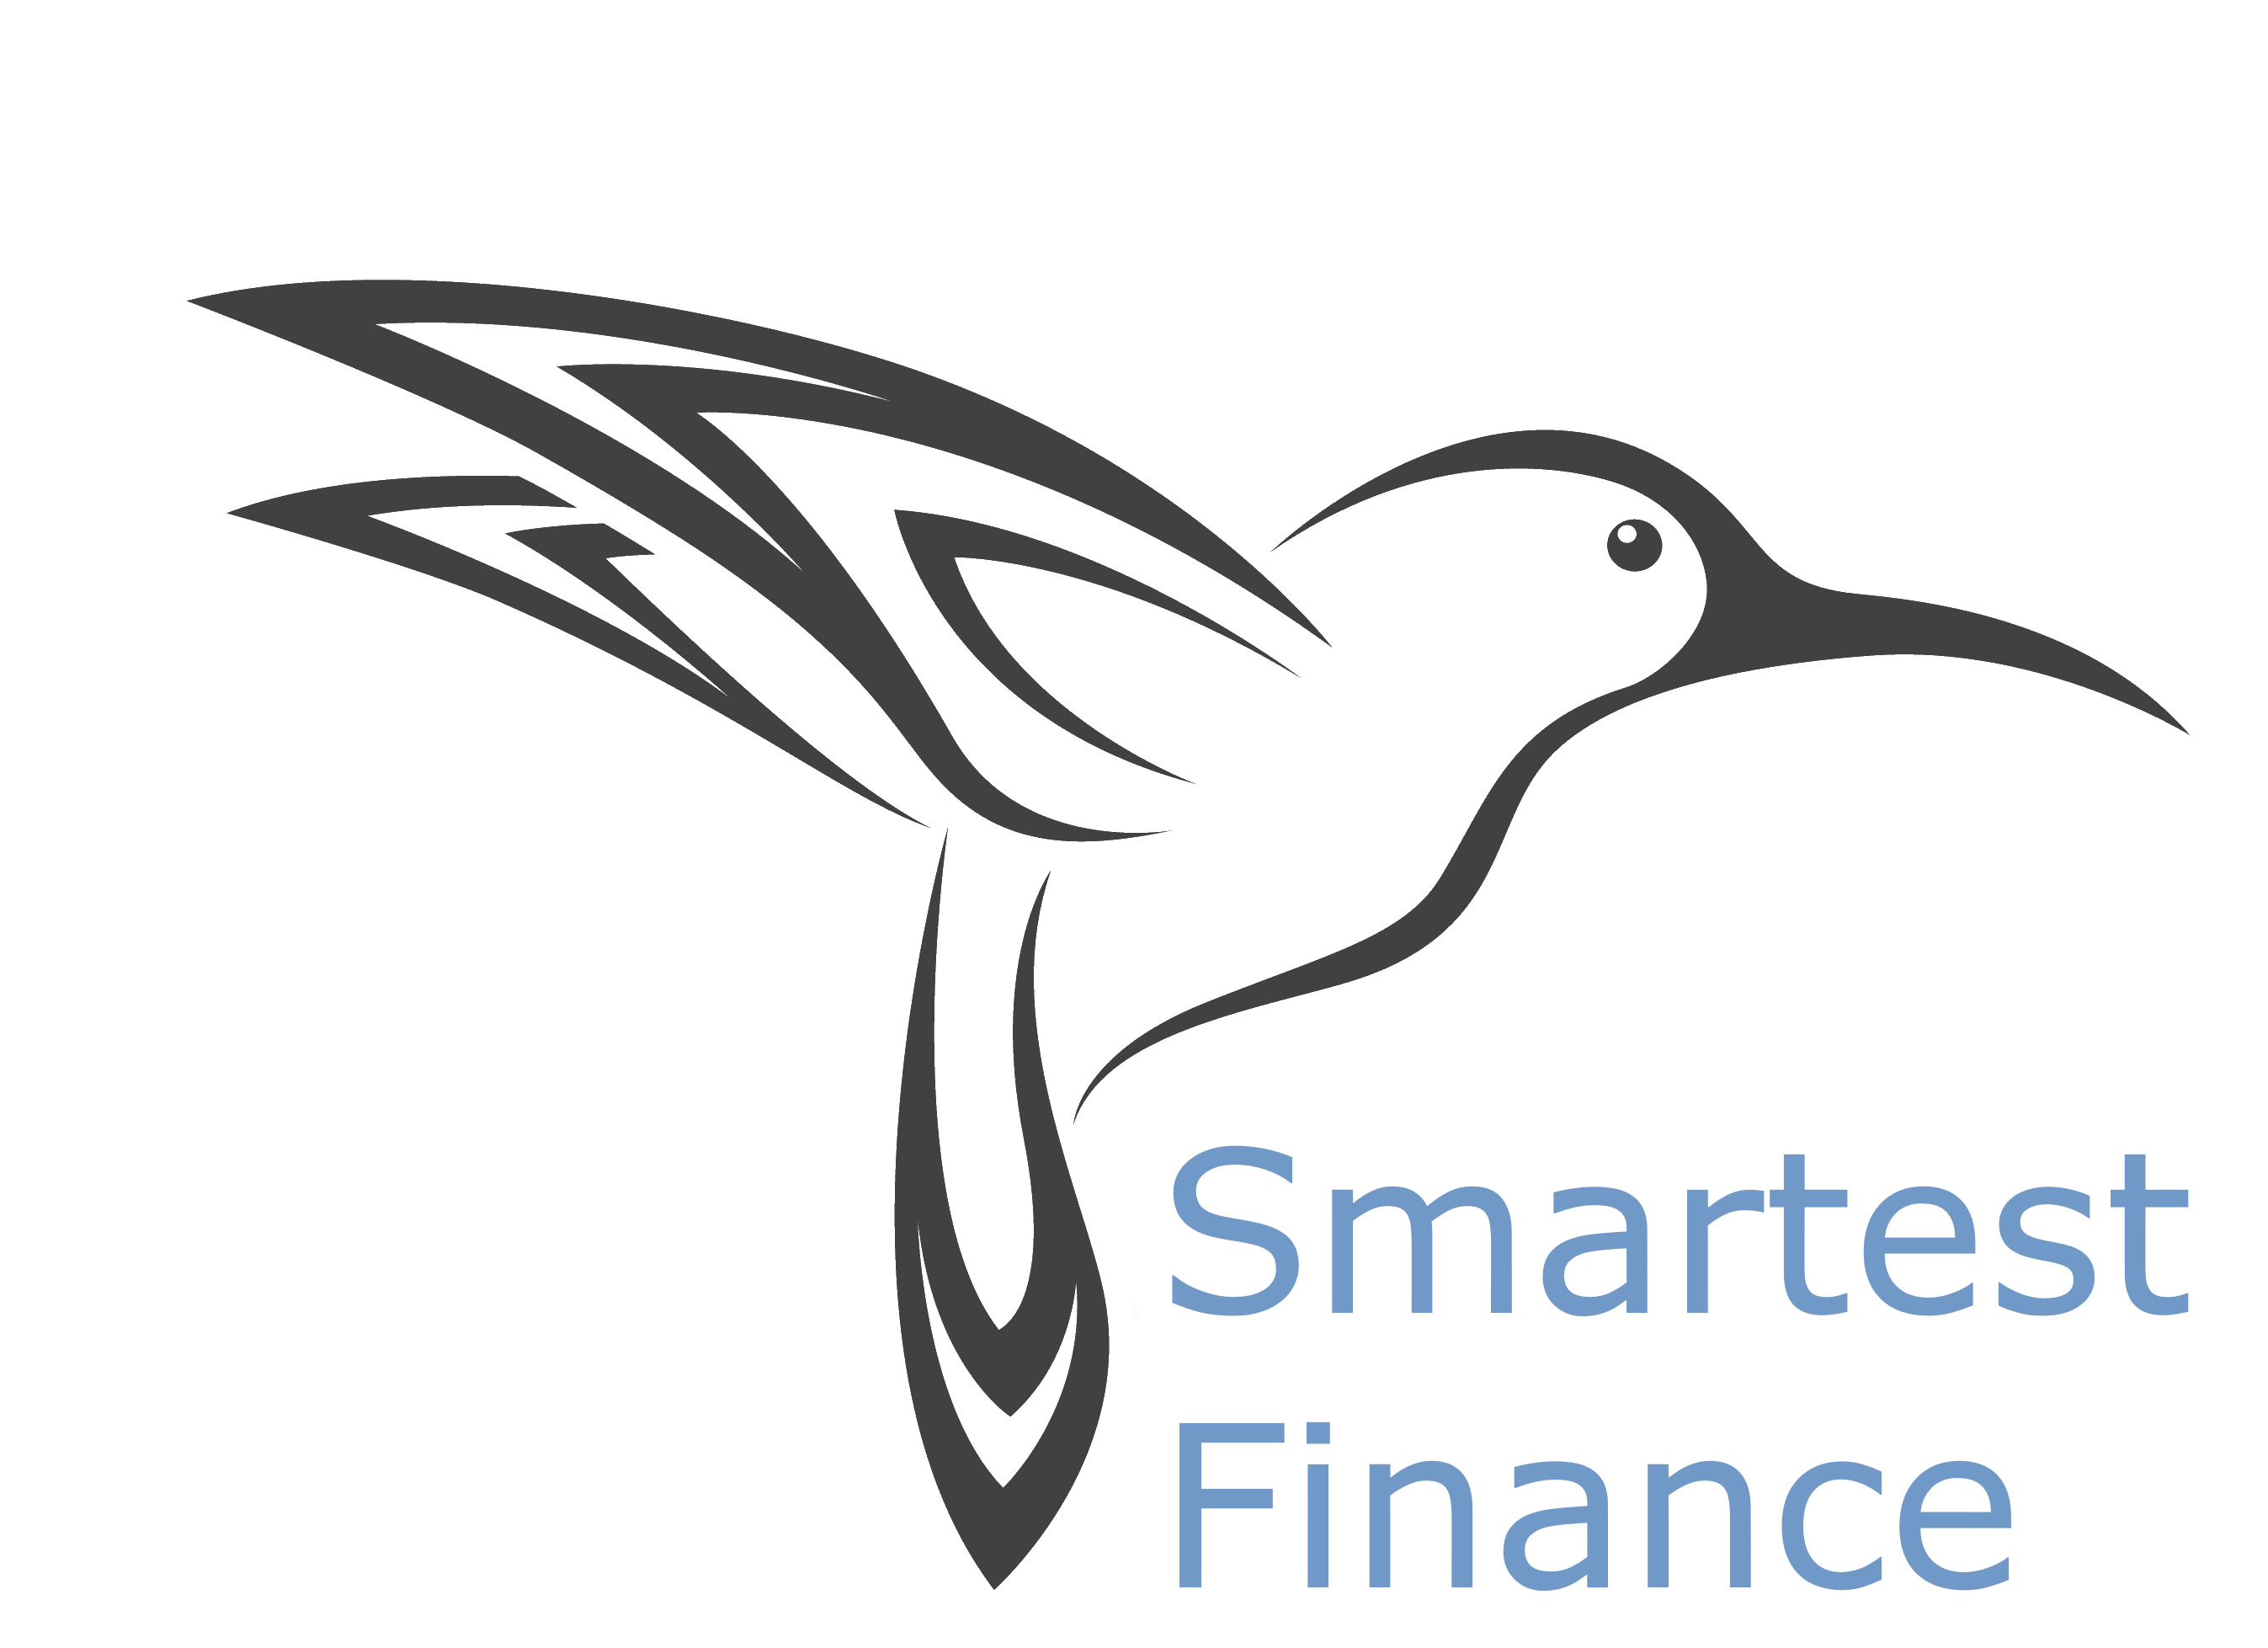 smartestfinance